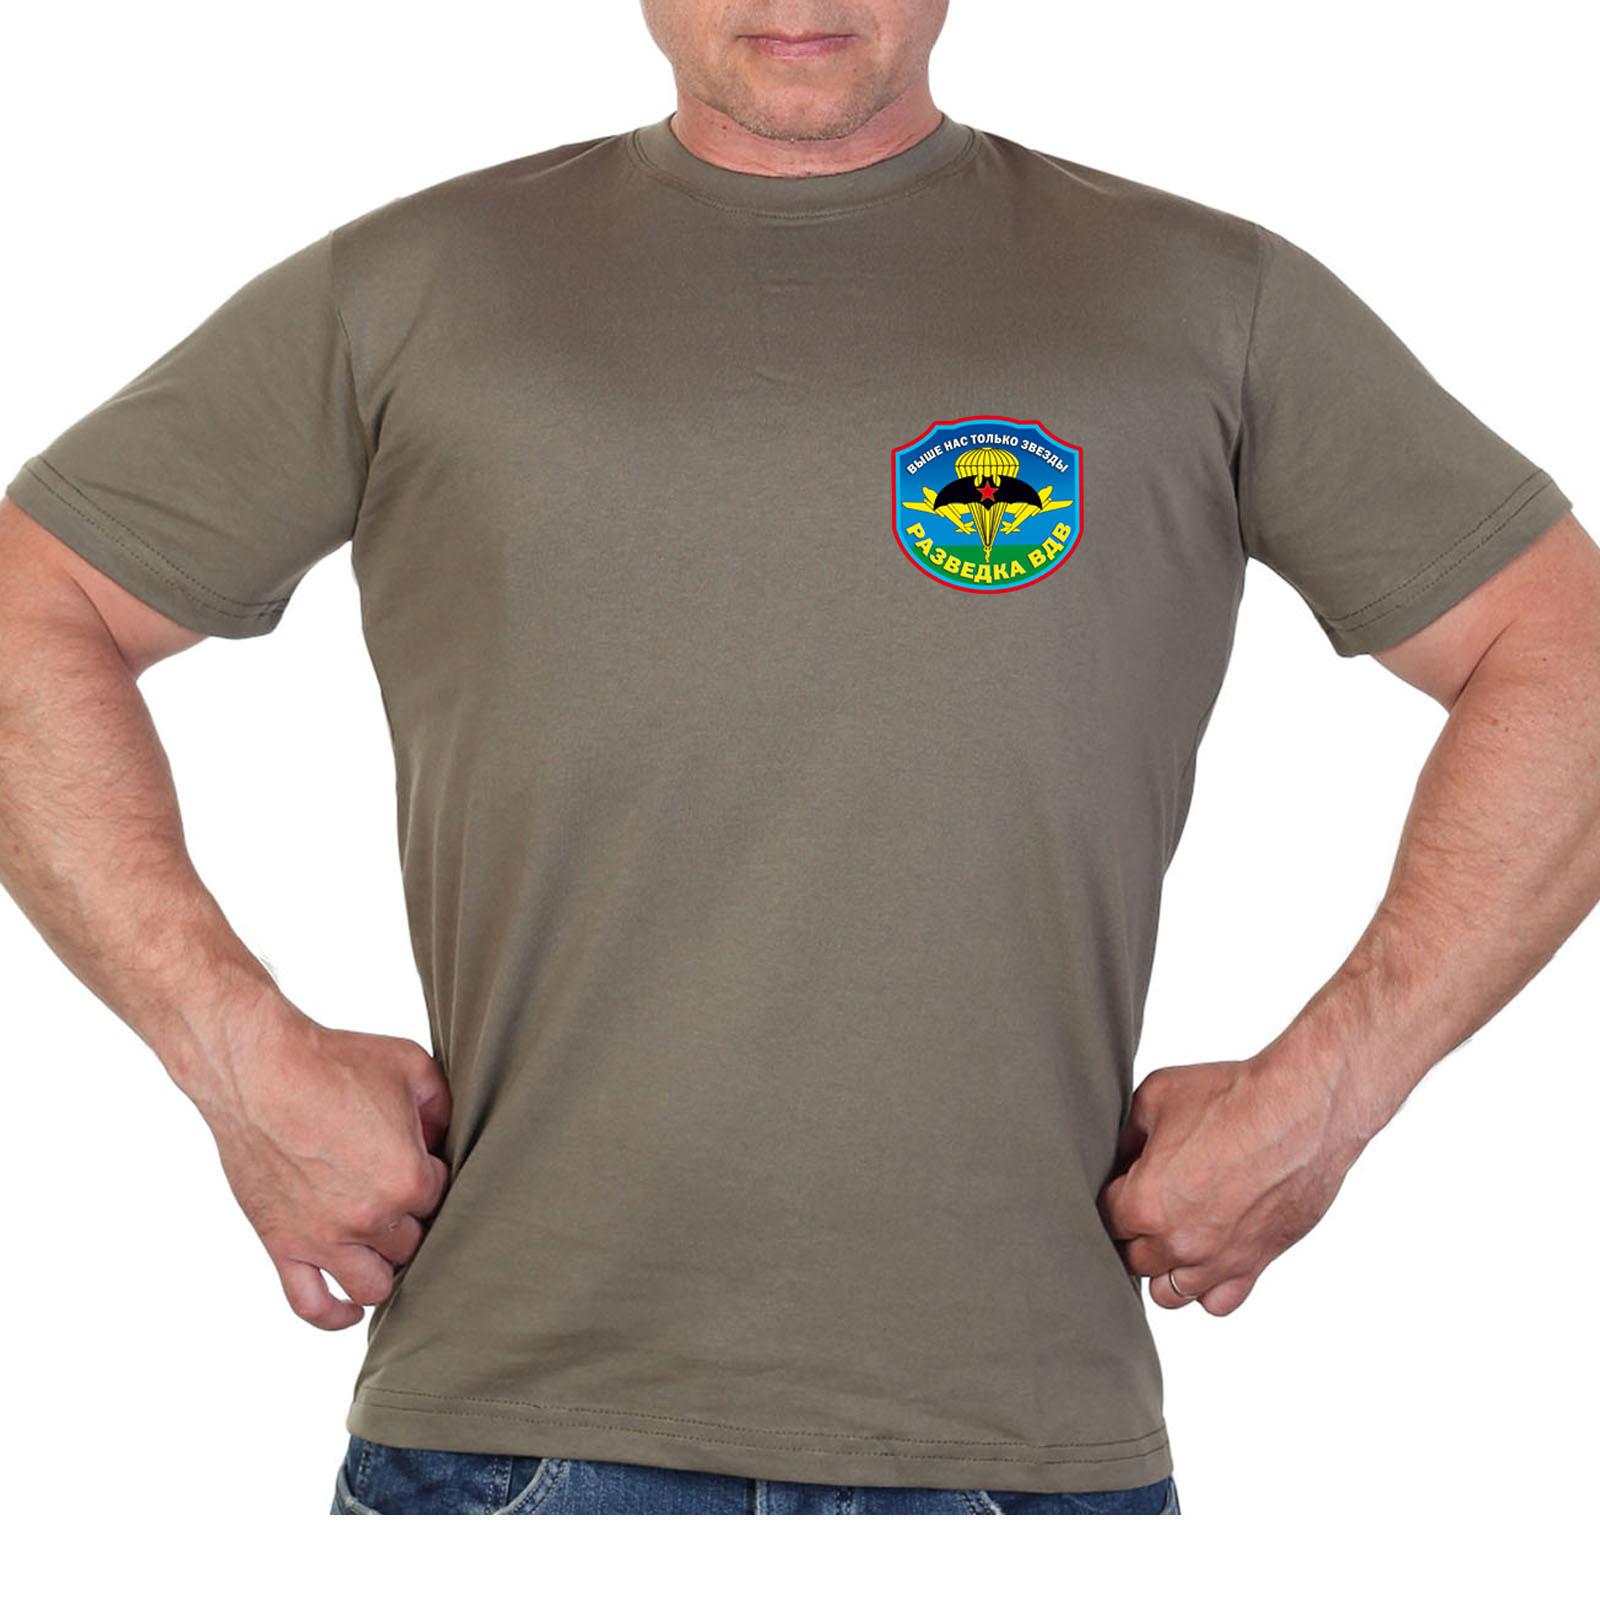 Оливковая футболка с термотрансфером Разведка ВДВ